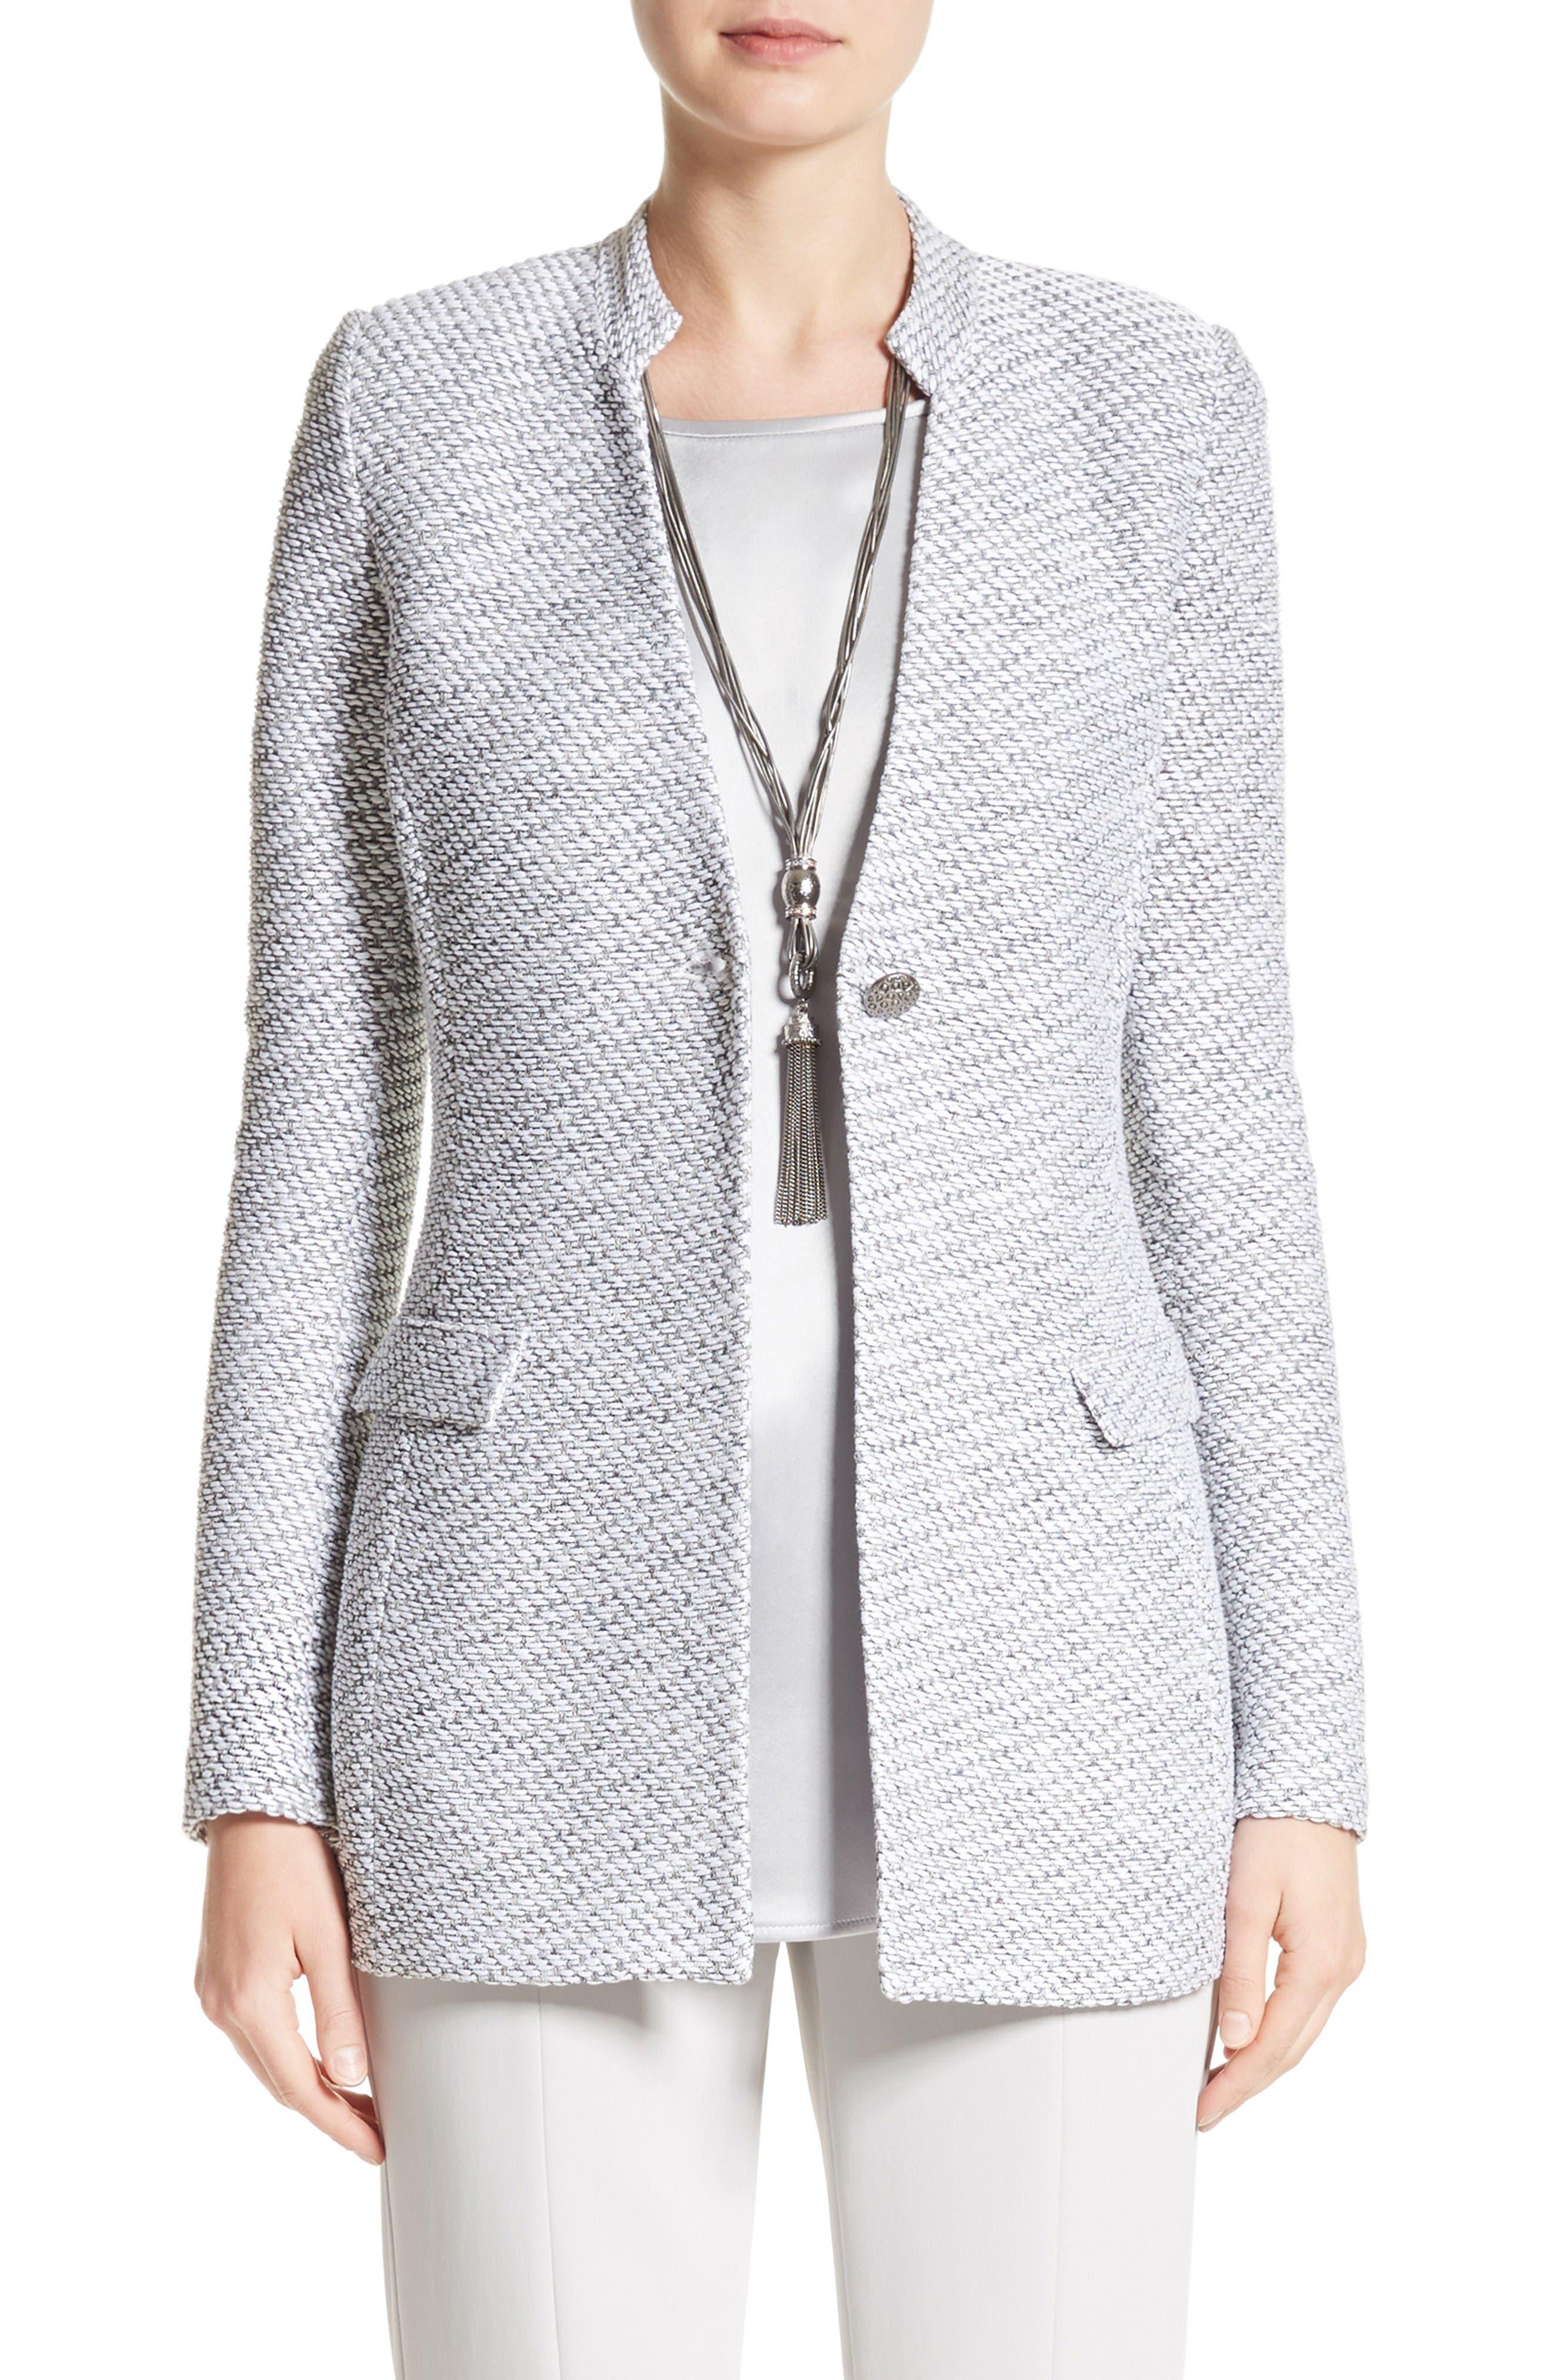 Gyan Knit Jacket,                         Main,                         color, Bianco/ Mica Multi